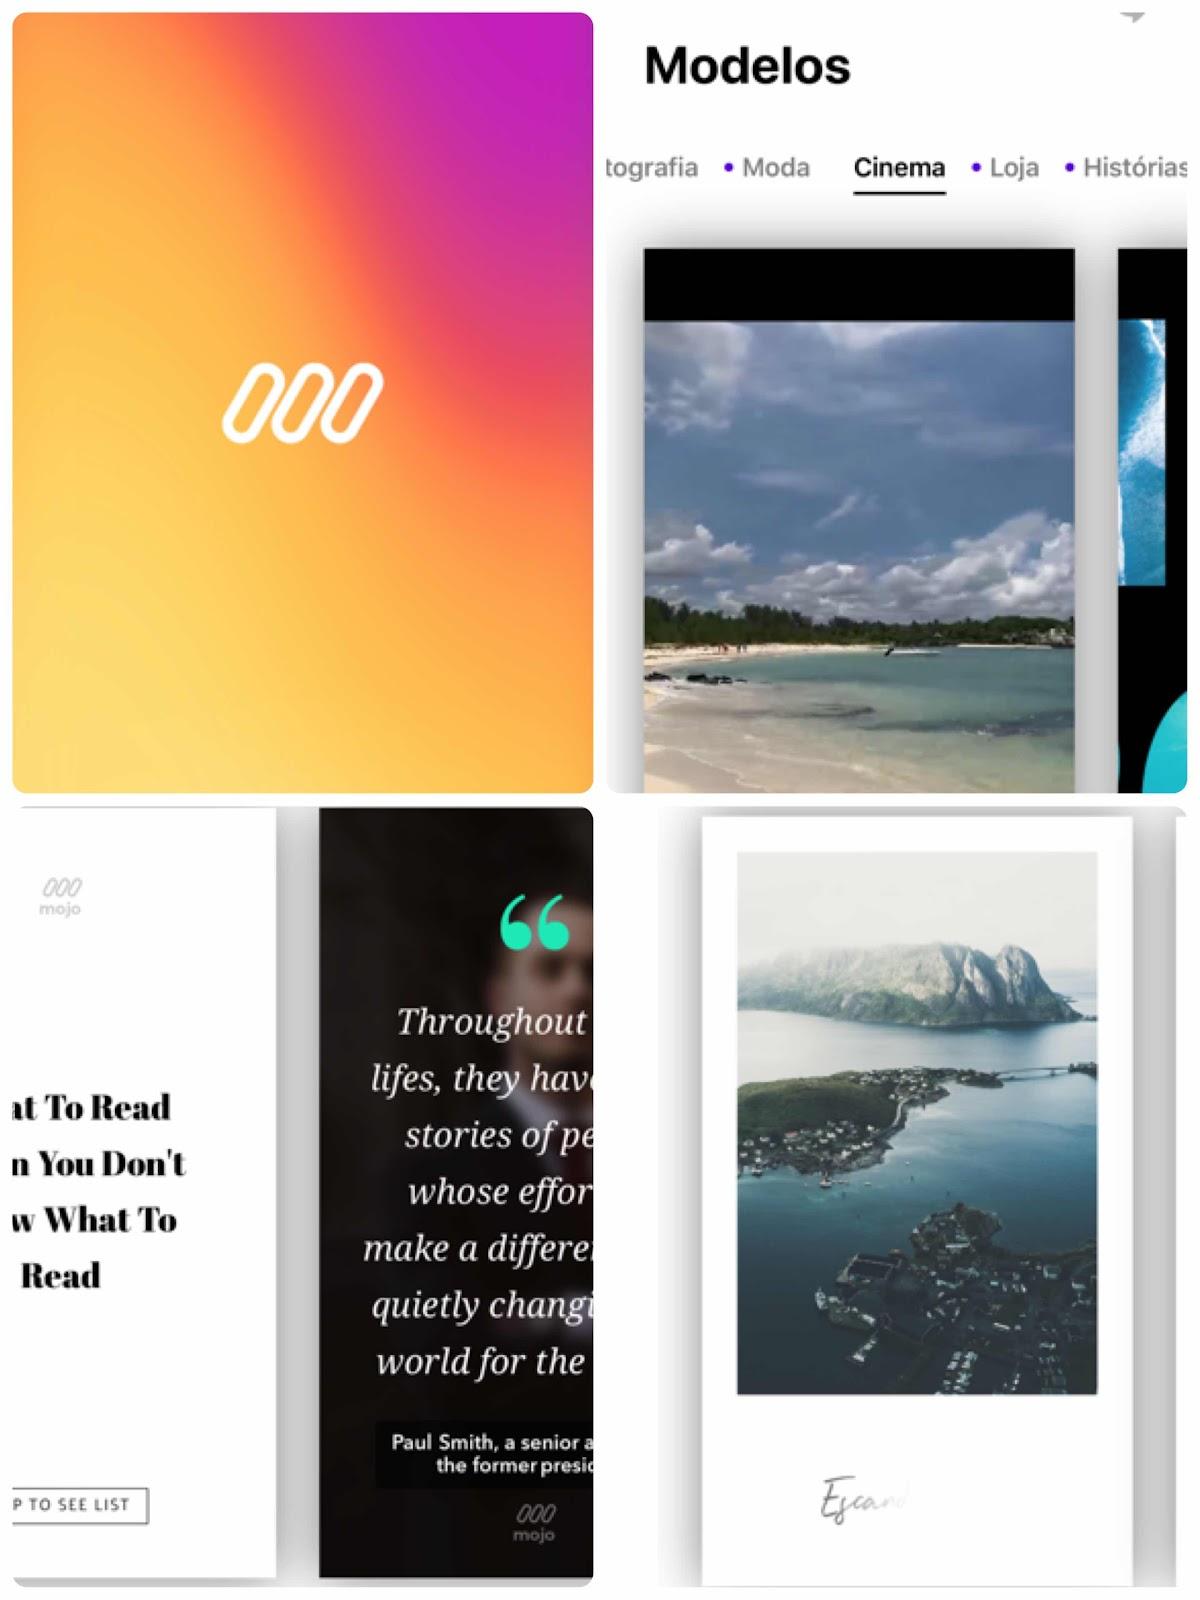 Dicas da Thatynha: Apps para bombar seus Stories